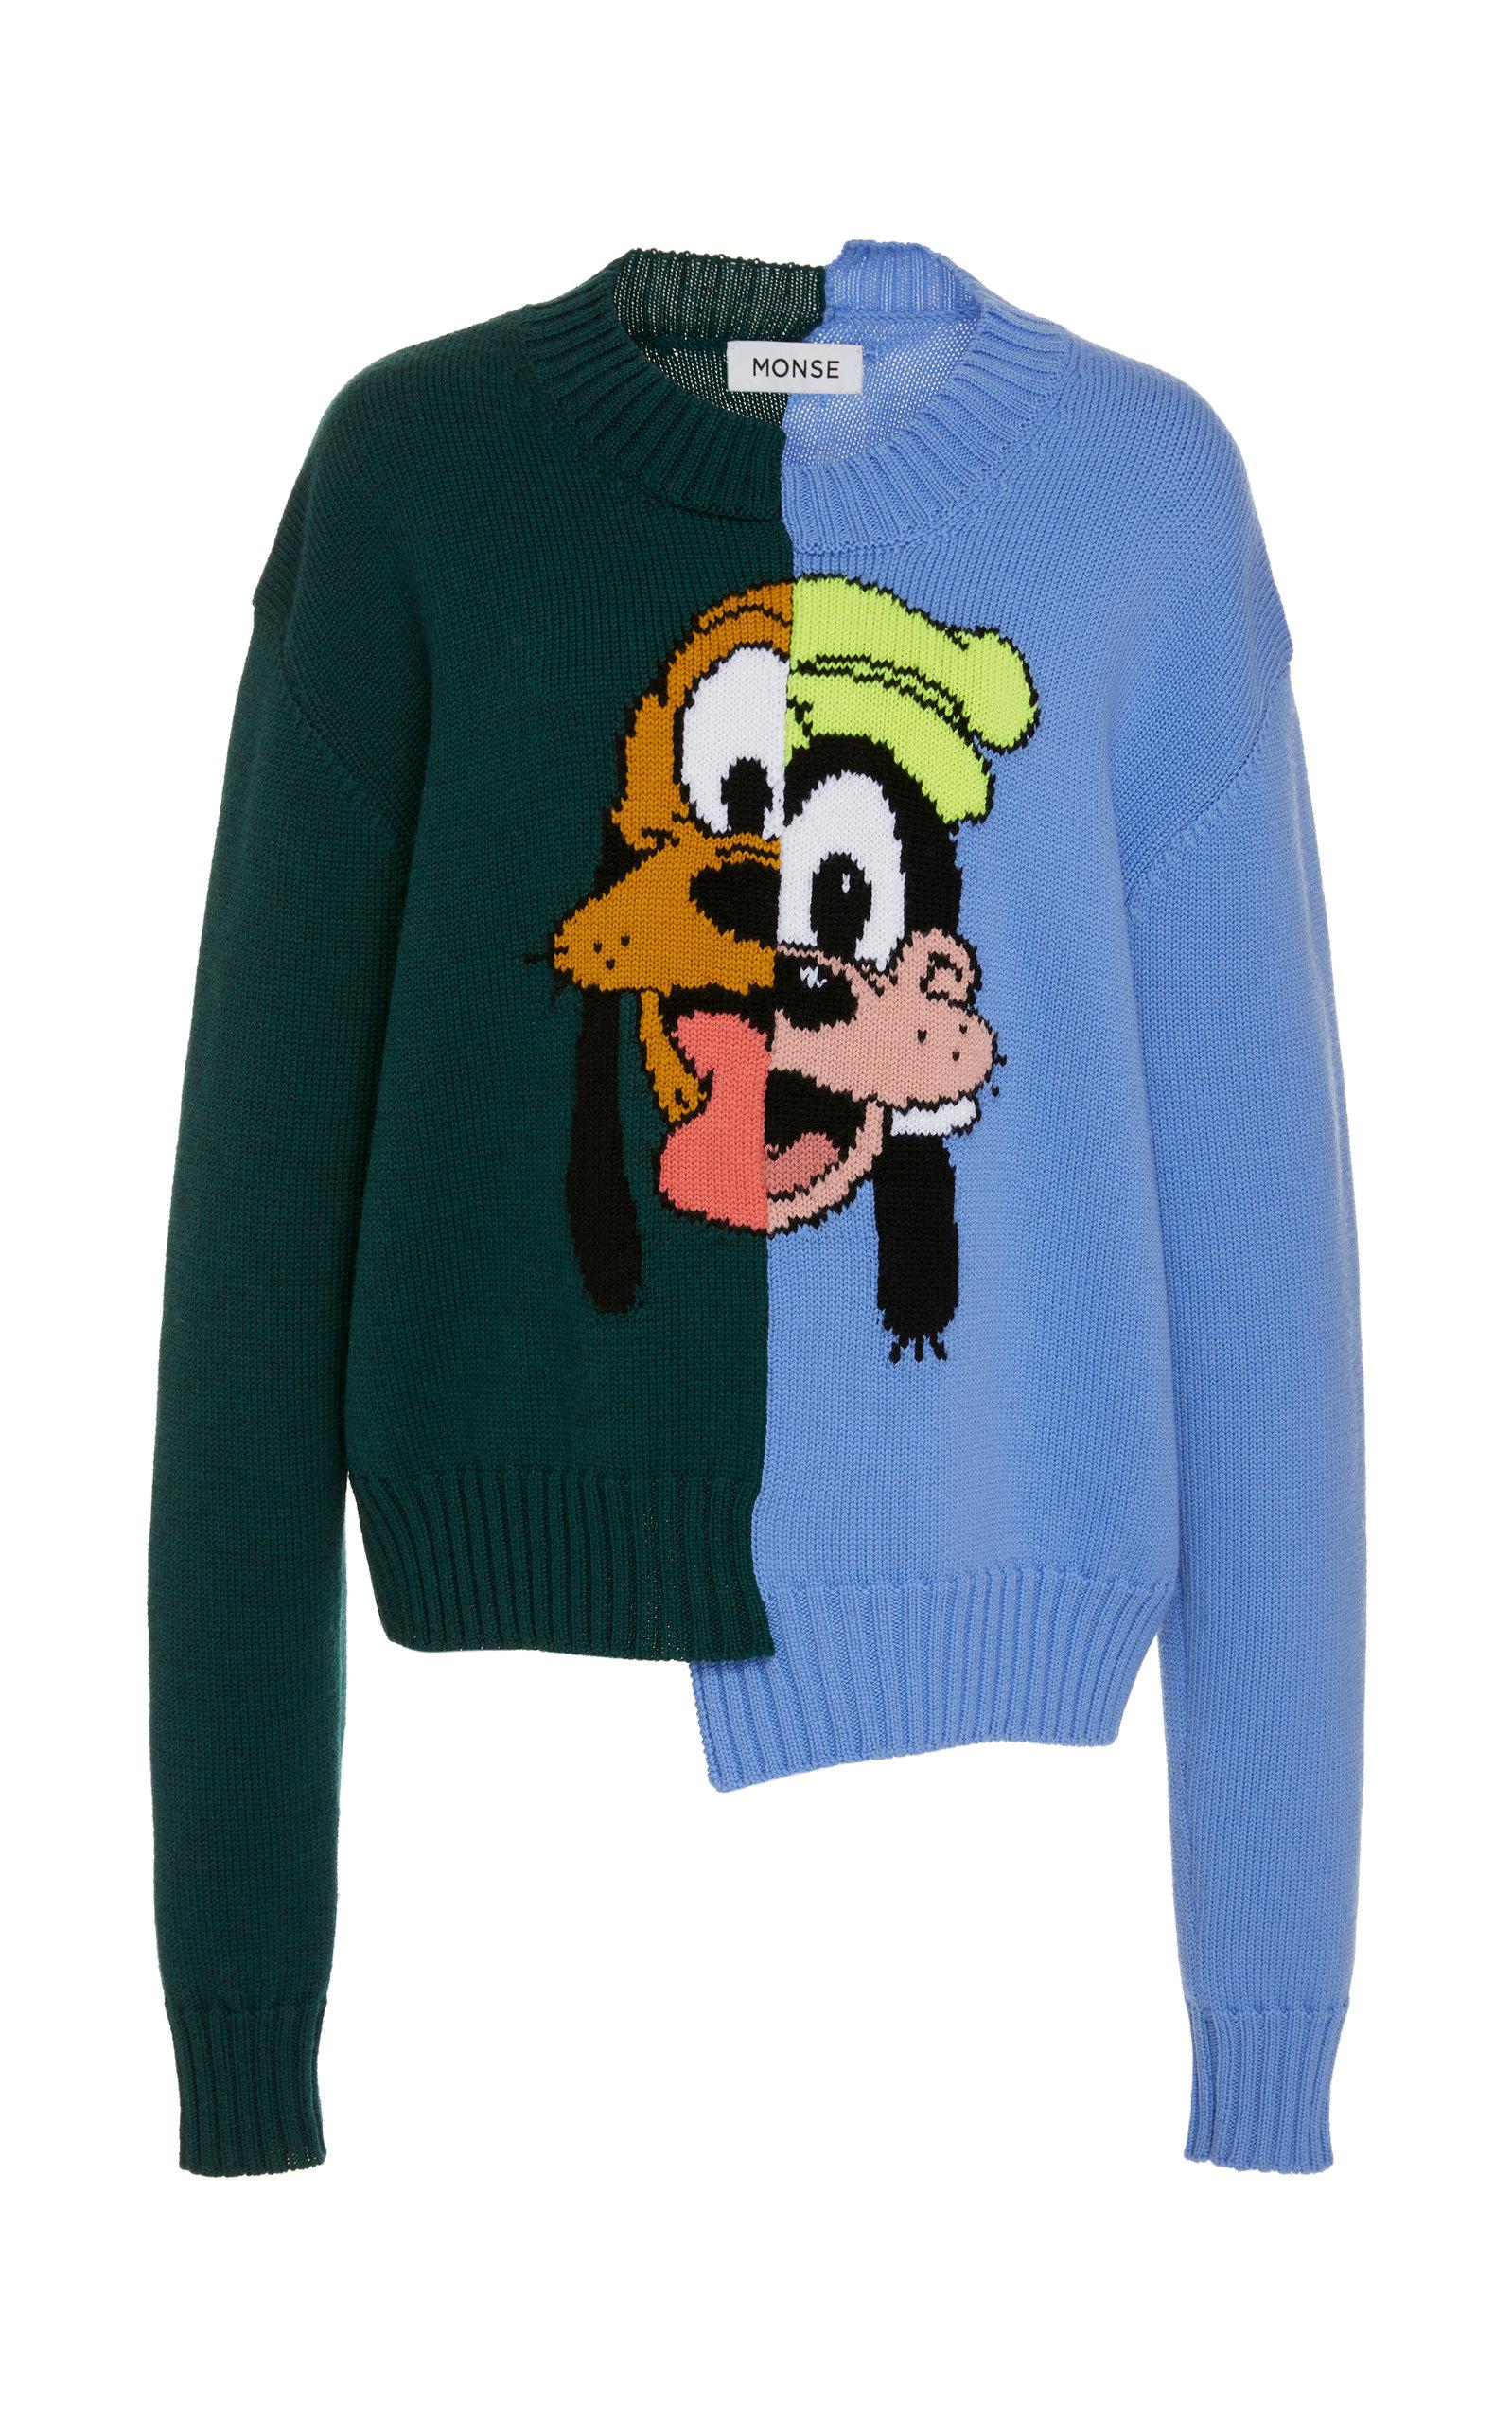 6228da41 Disney's Split Pluto And Goofy Wool Sweater by MONSE | Moda Operandi